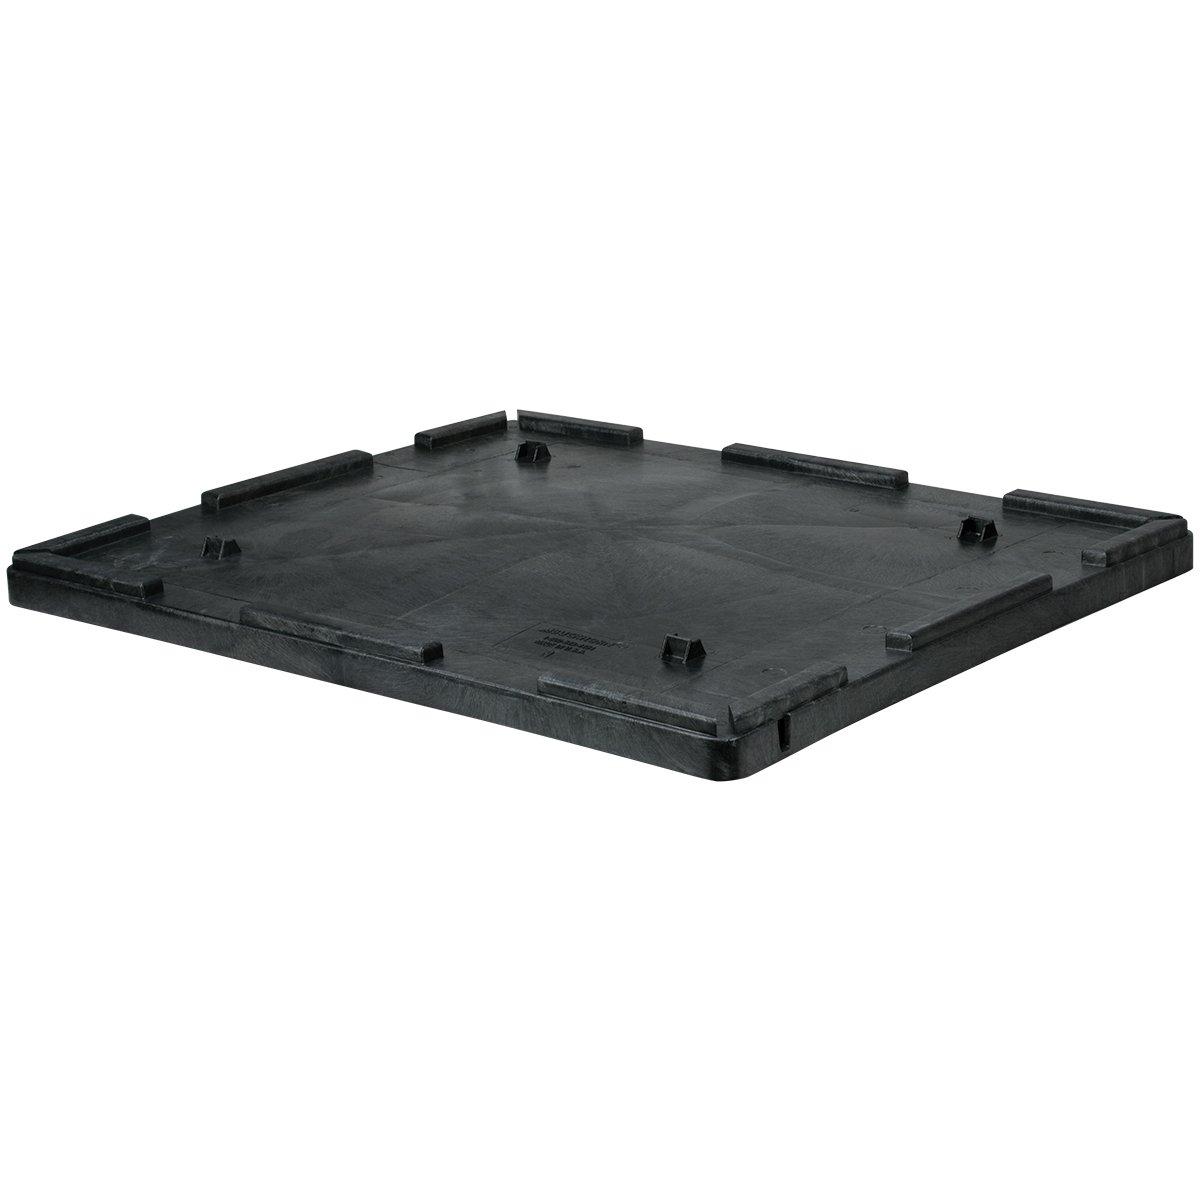 Buckhorn TL4844030010000 48'' x 44'' Structural Foam Bulk Container Lid, Black